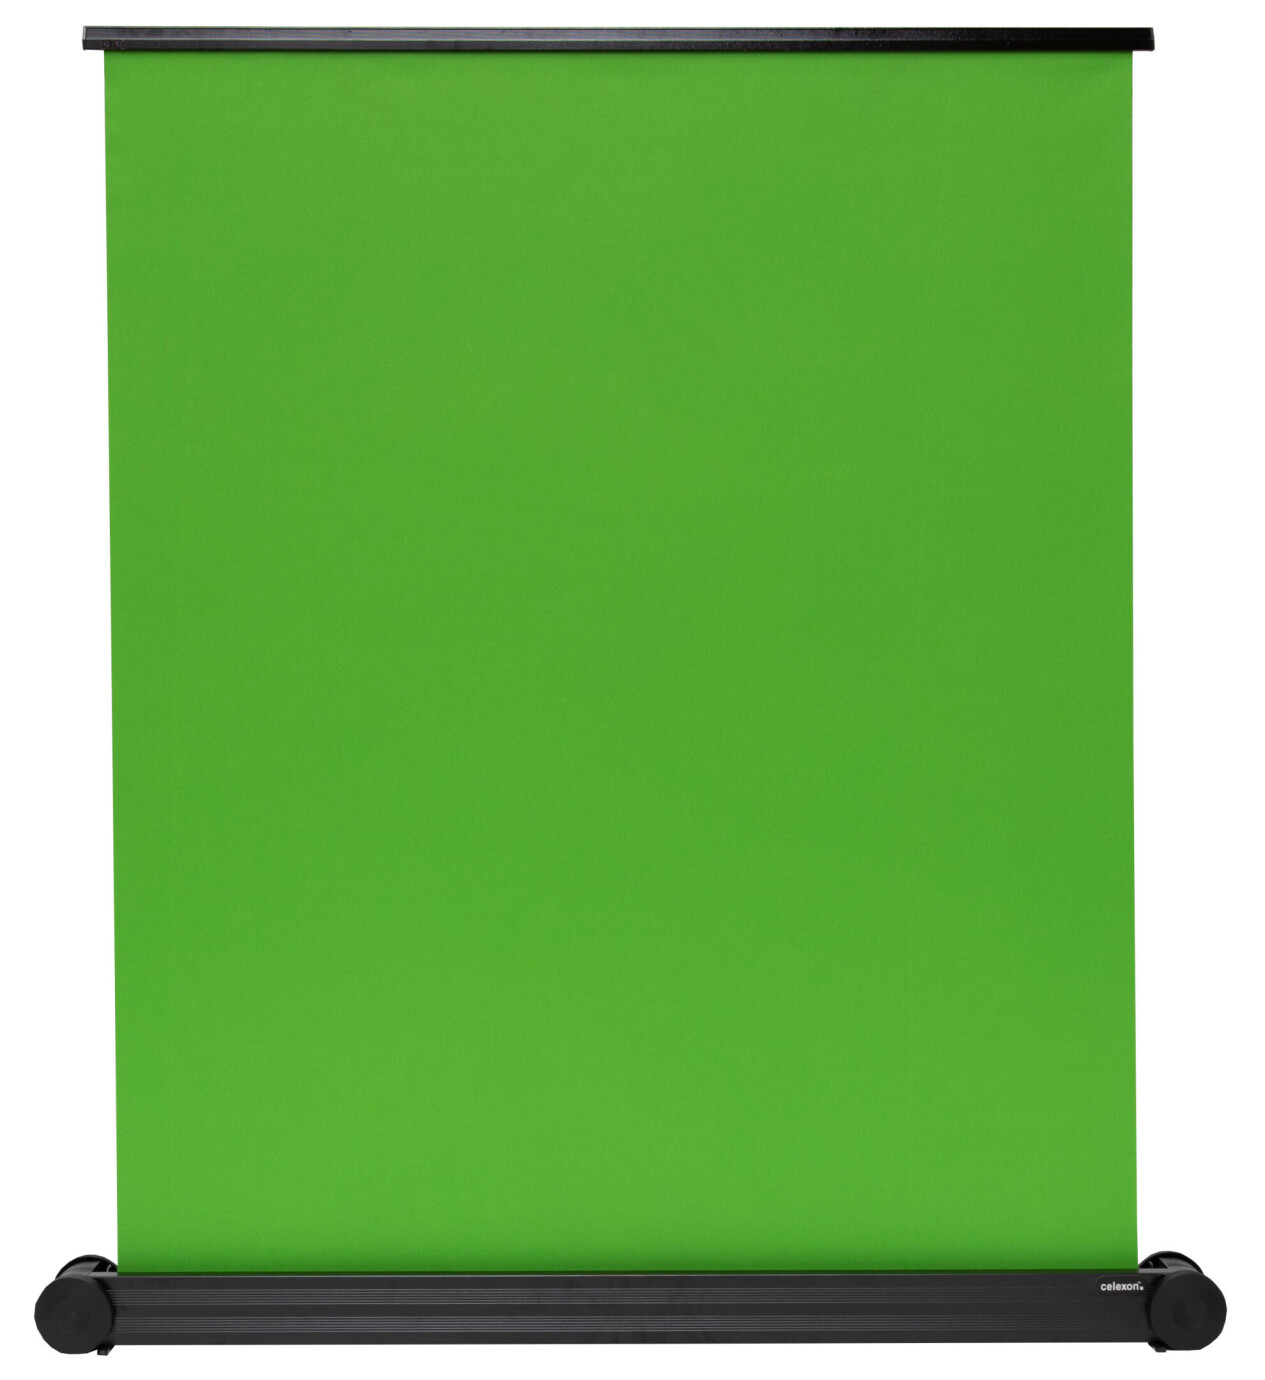 Écran à fond vert celexon mobile Chroma Key Green 150 x 180 cm